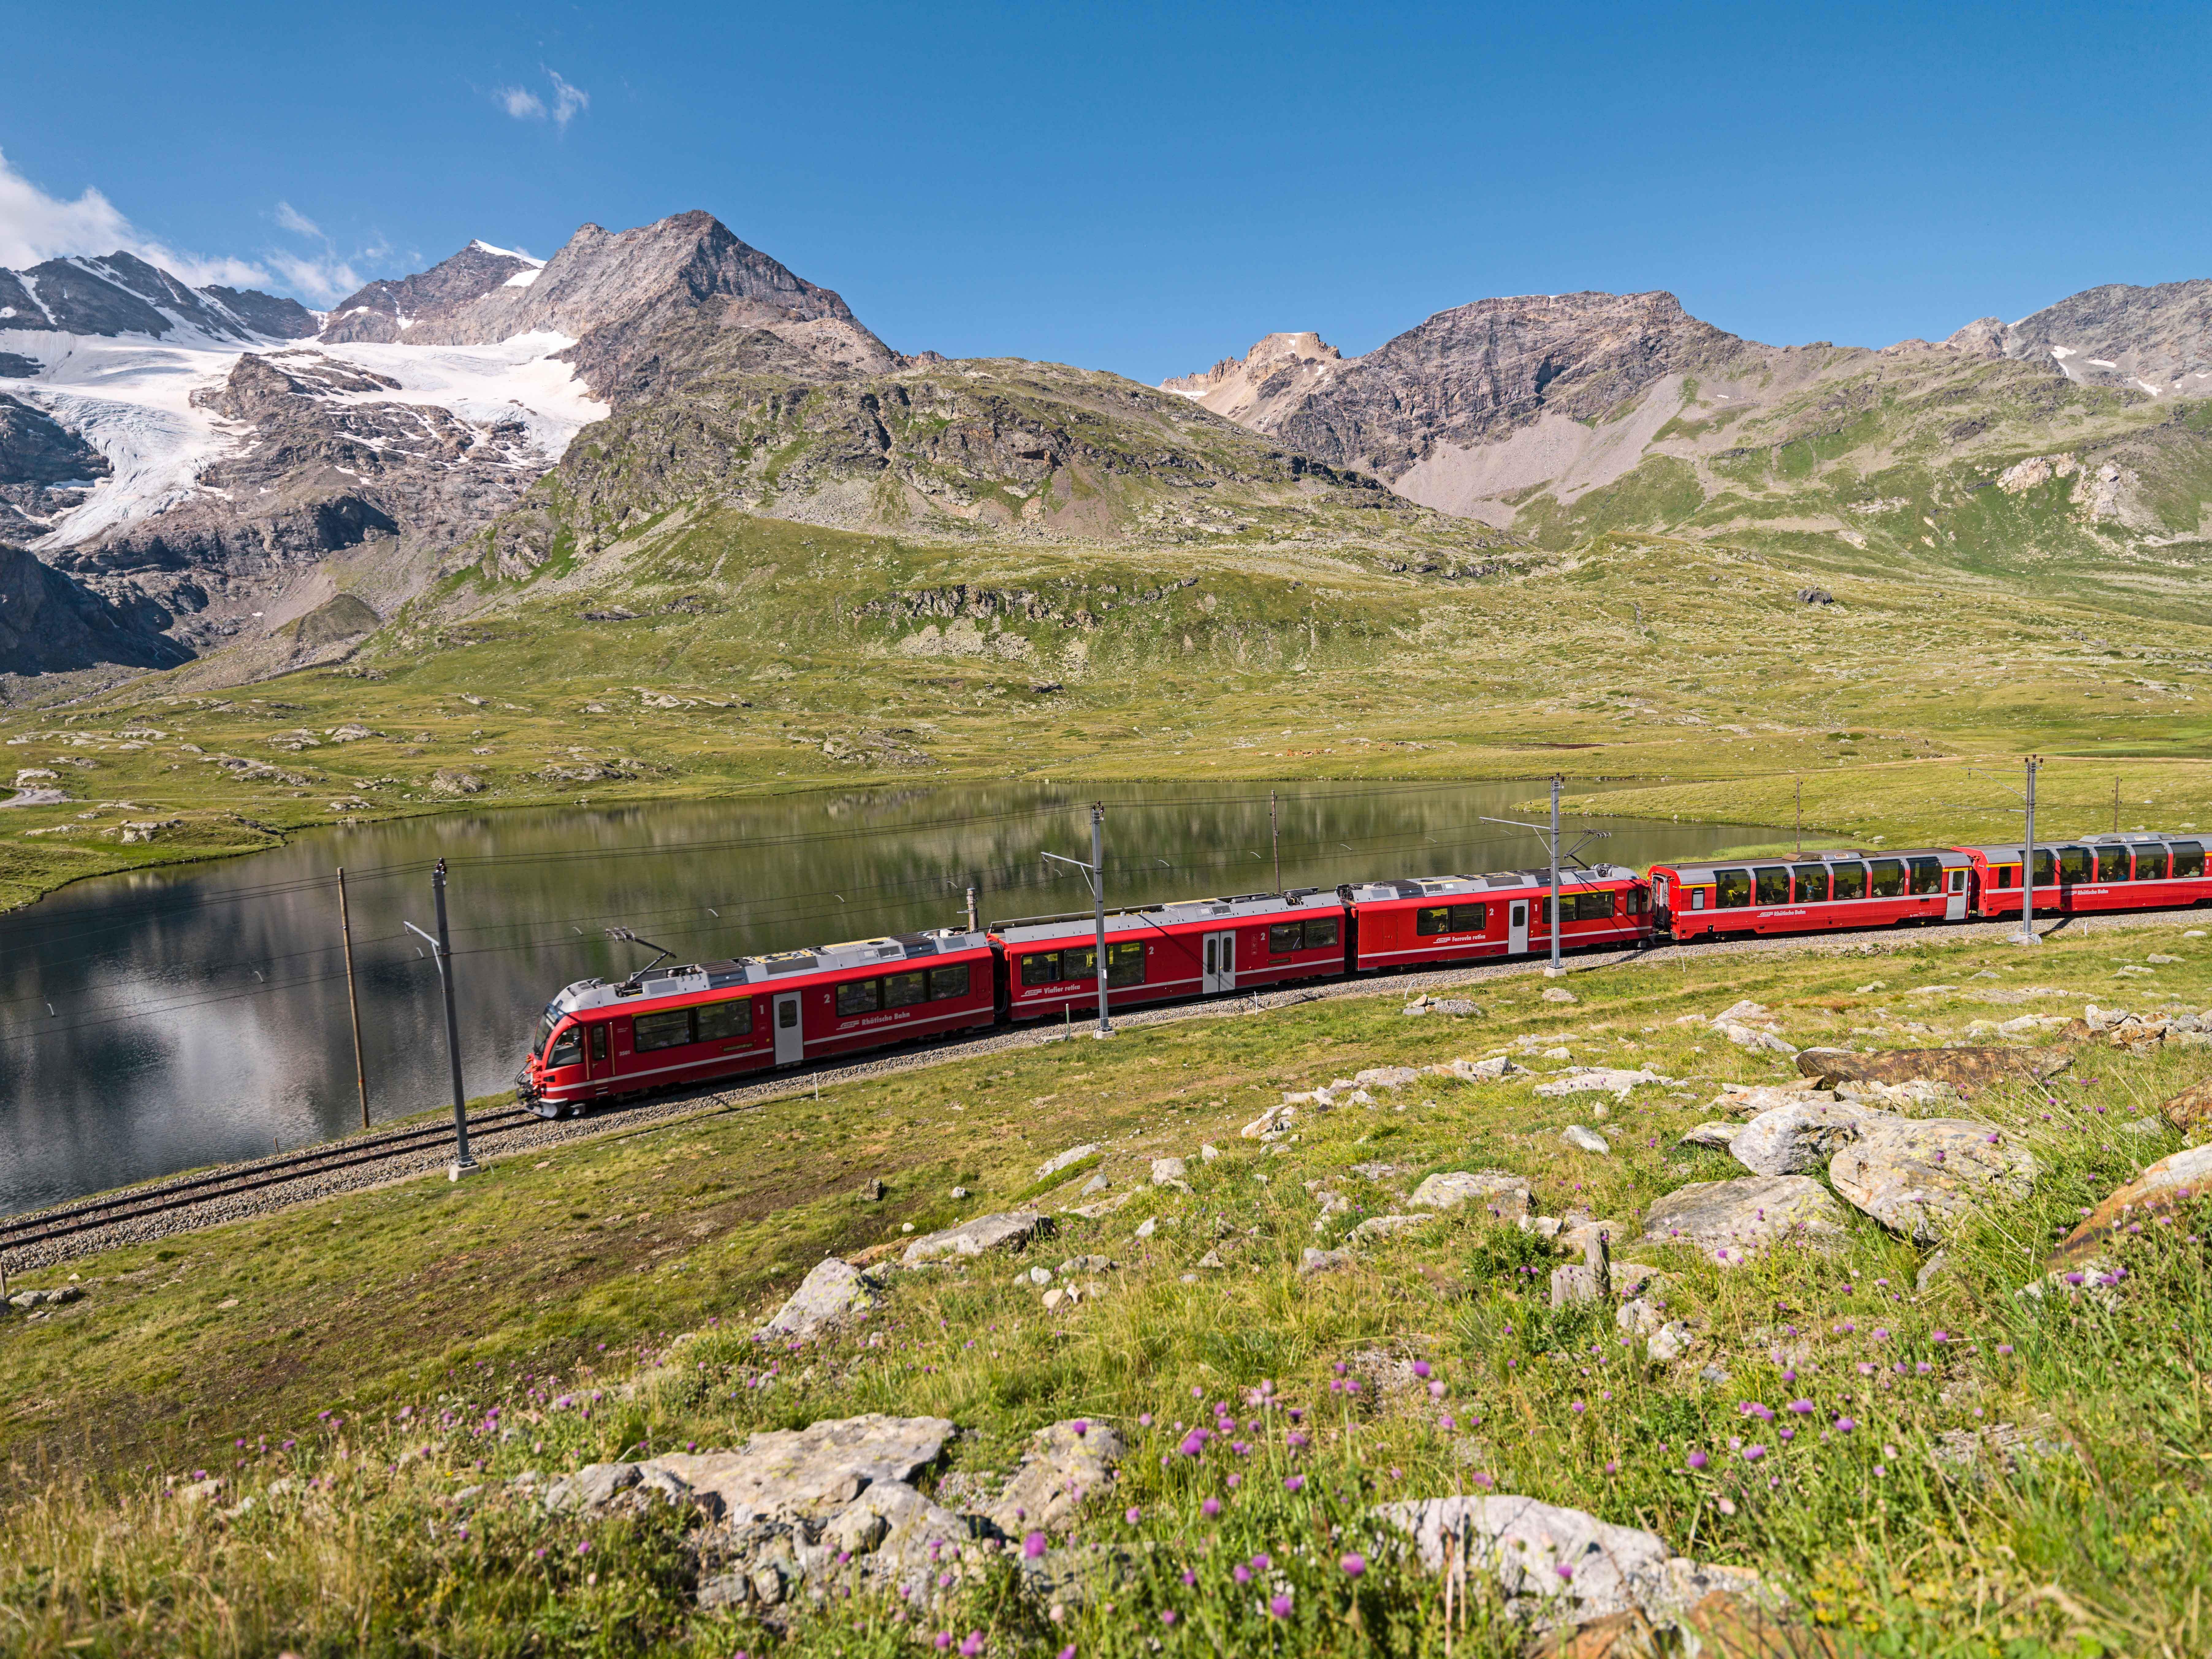 Mountain bike transport: Rhaetian Railway